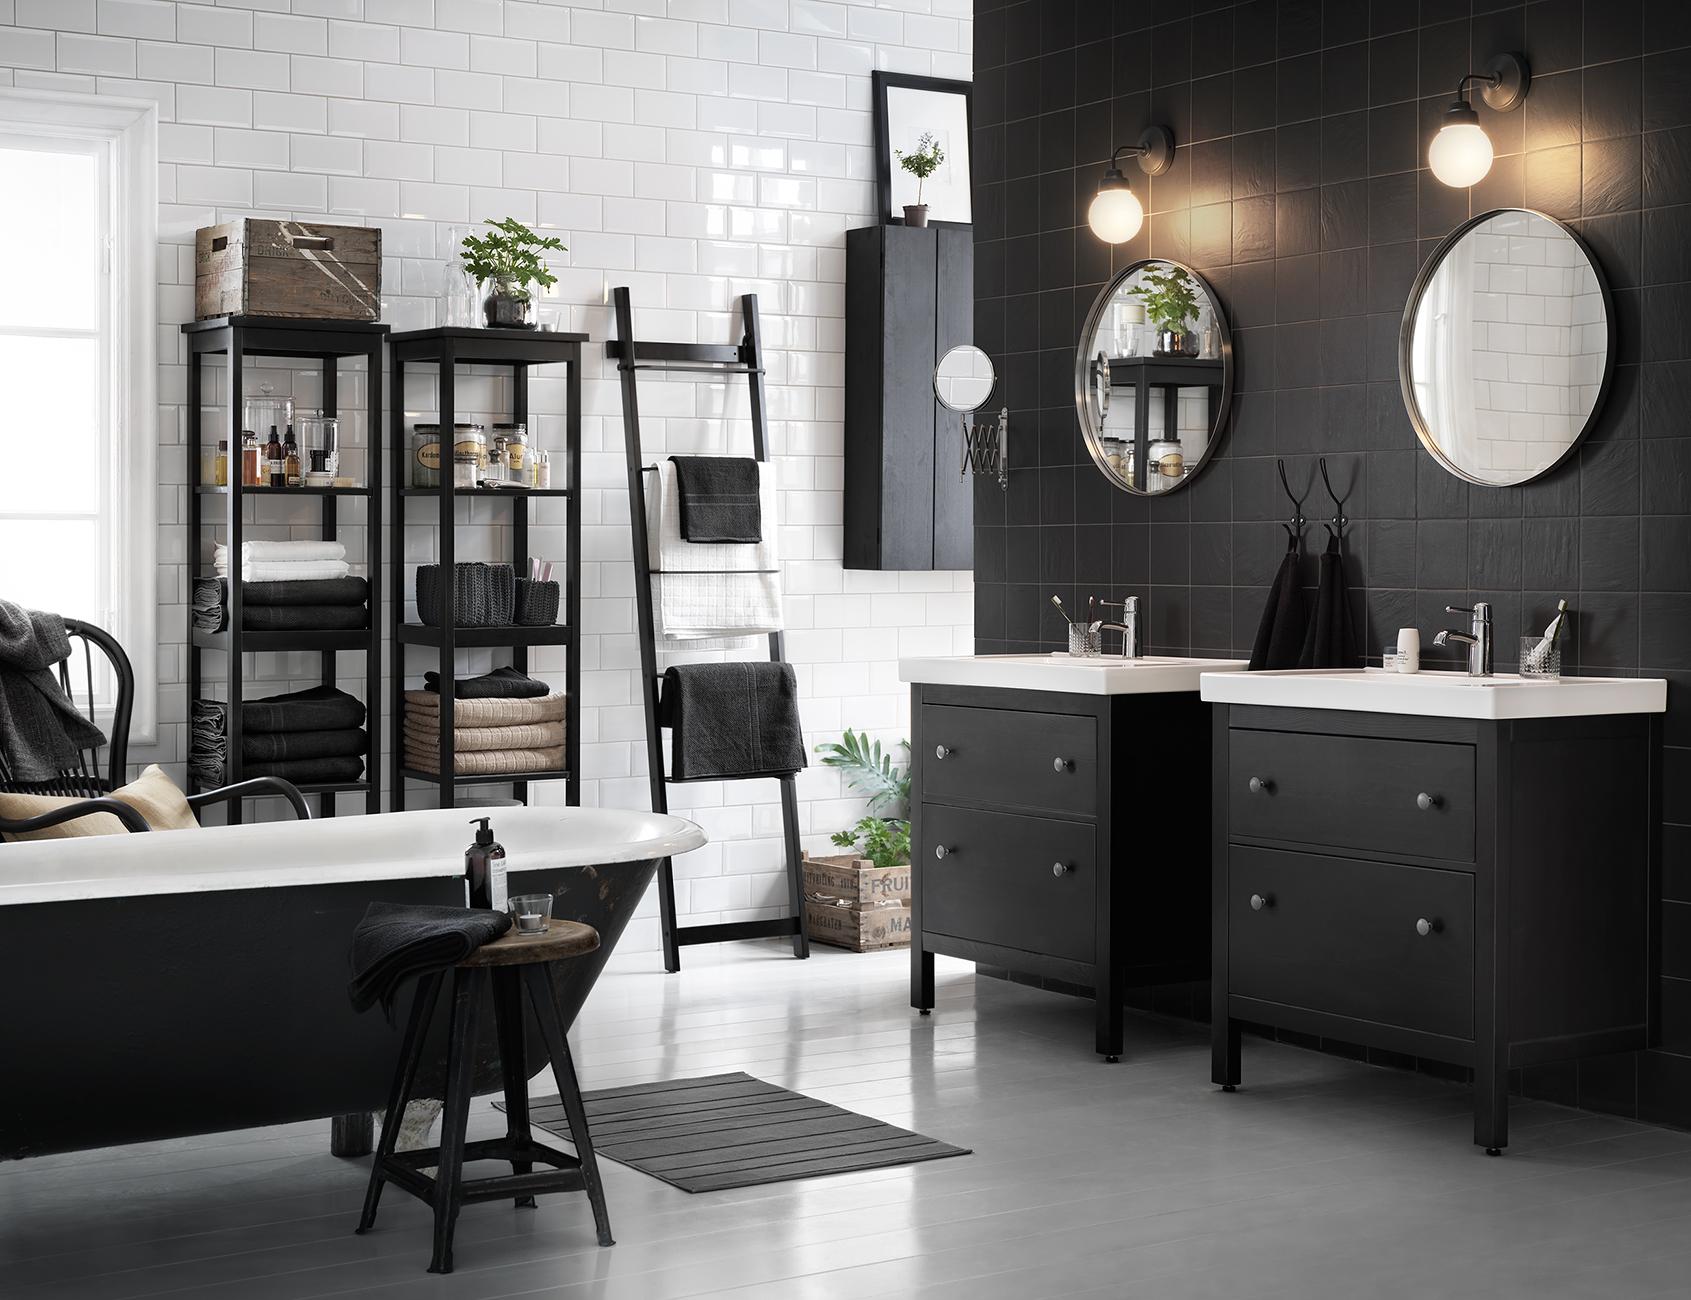 Inredningshj lpen badrumsinspiration fr n ikea for Salle de bain ikea 2015